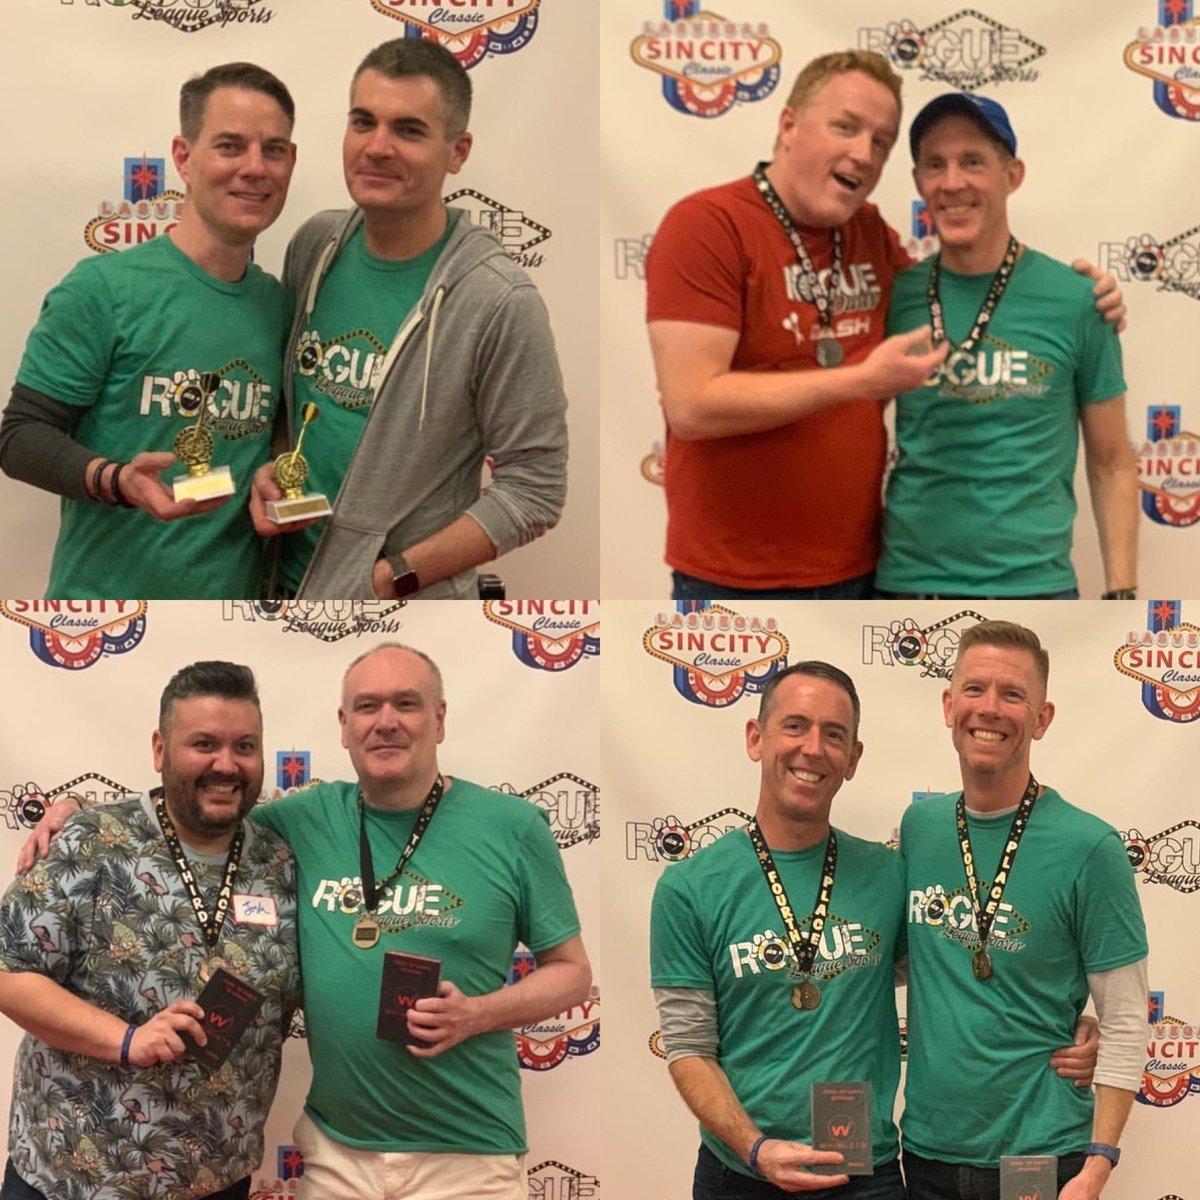 Congrats to the first ever #SinCityClassic Steel-Tip #Darts top 4️⃣ teams! 🎯   Fantastic job @RogueDarts! 👏